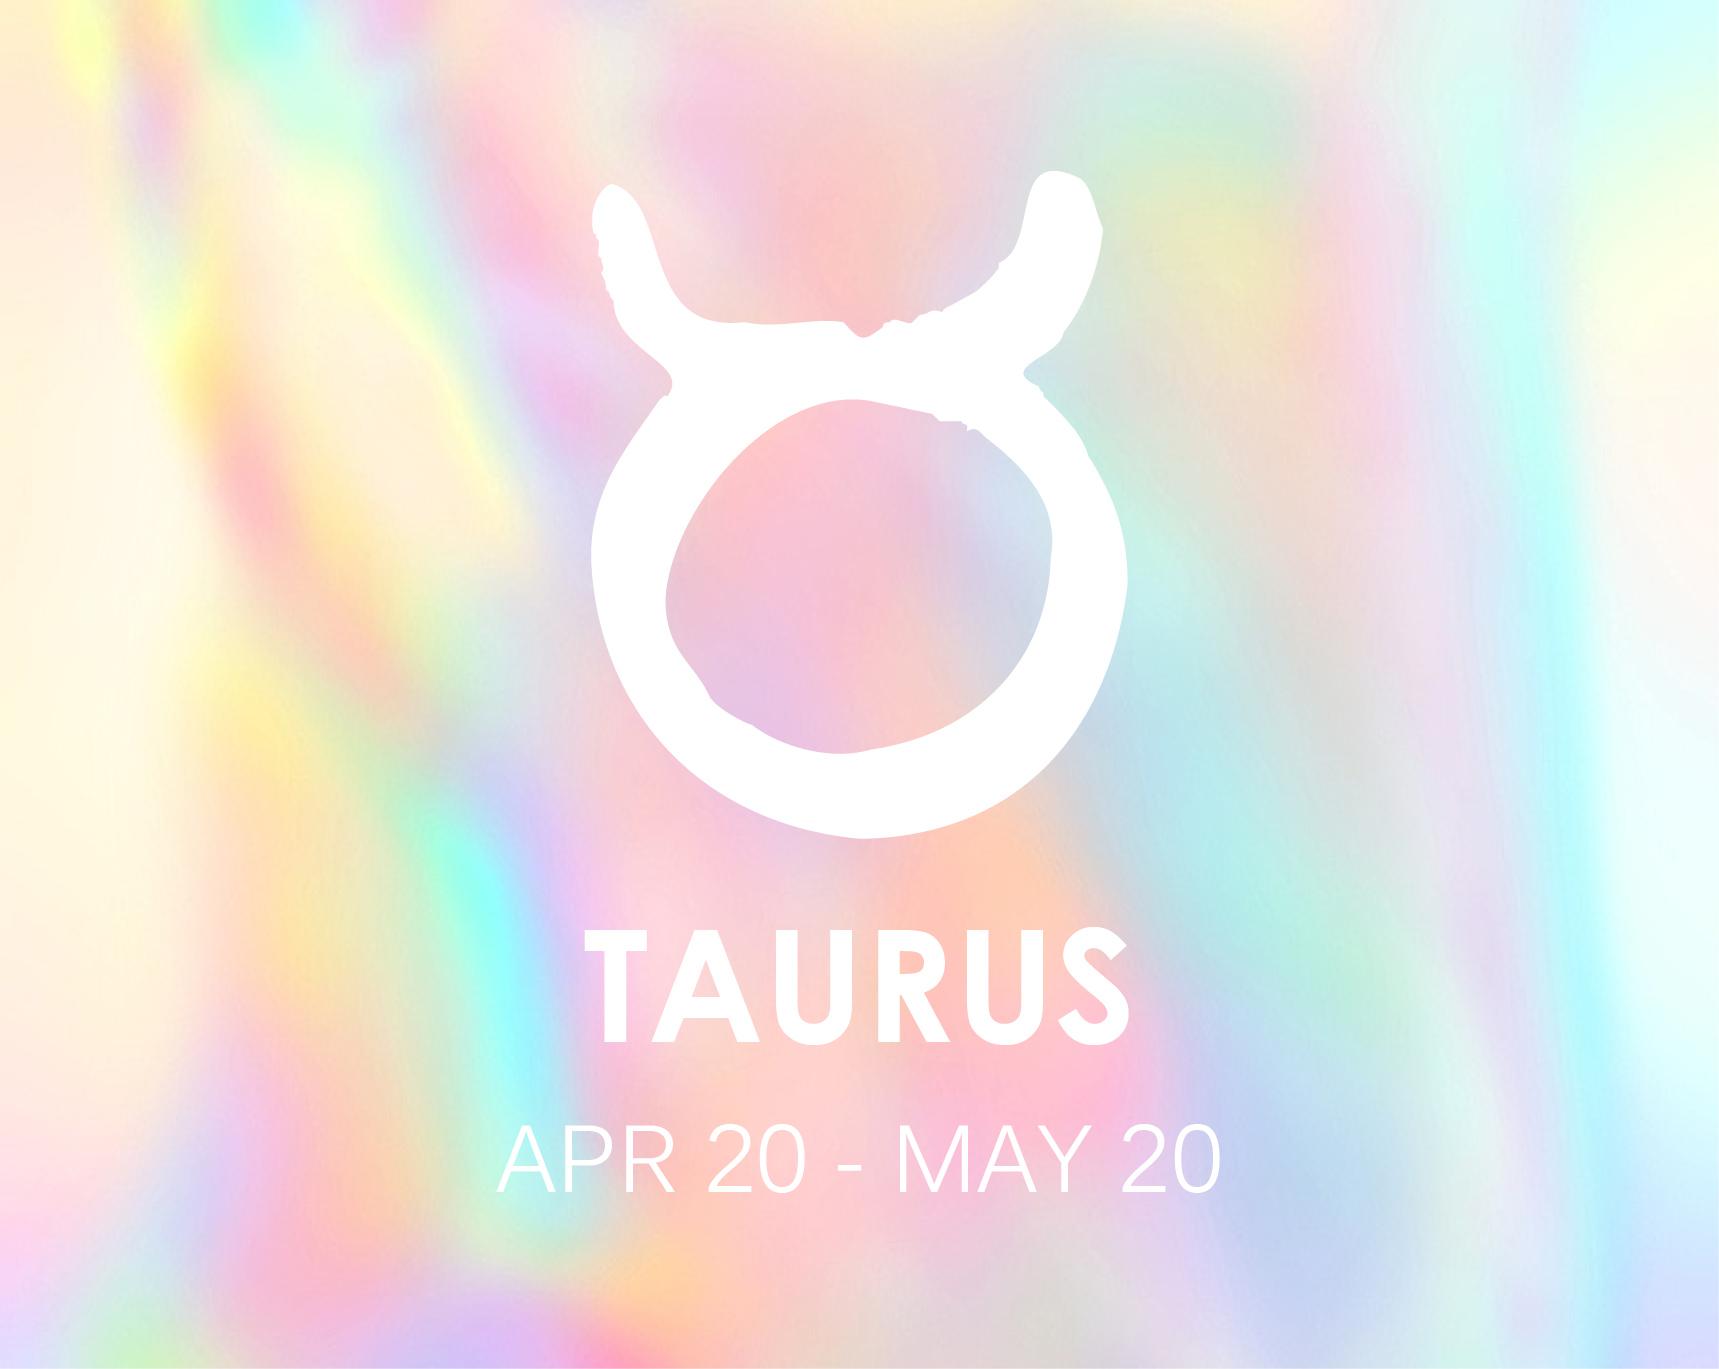 THE LOVERApril 21st -- May 21stModality: Fixed (Taurus, Leo, Scorpio + Aquarius)Element: Earth (Taurus, Virgo + Capricorn)Ruling Planet: Venus -